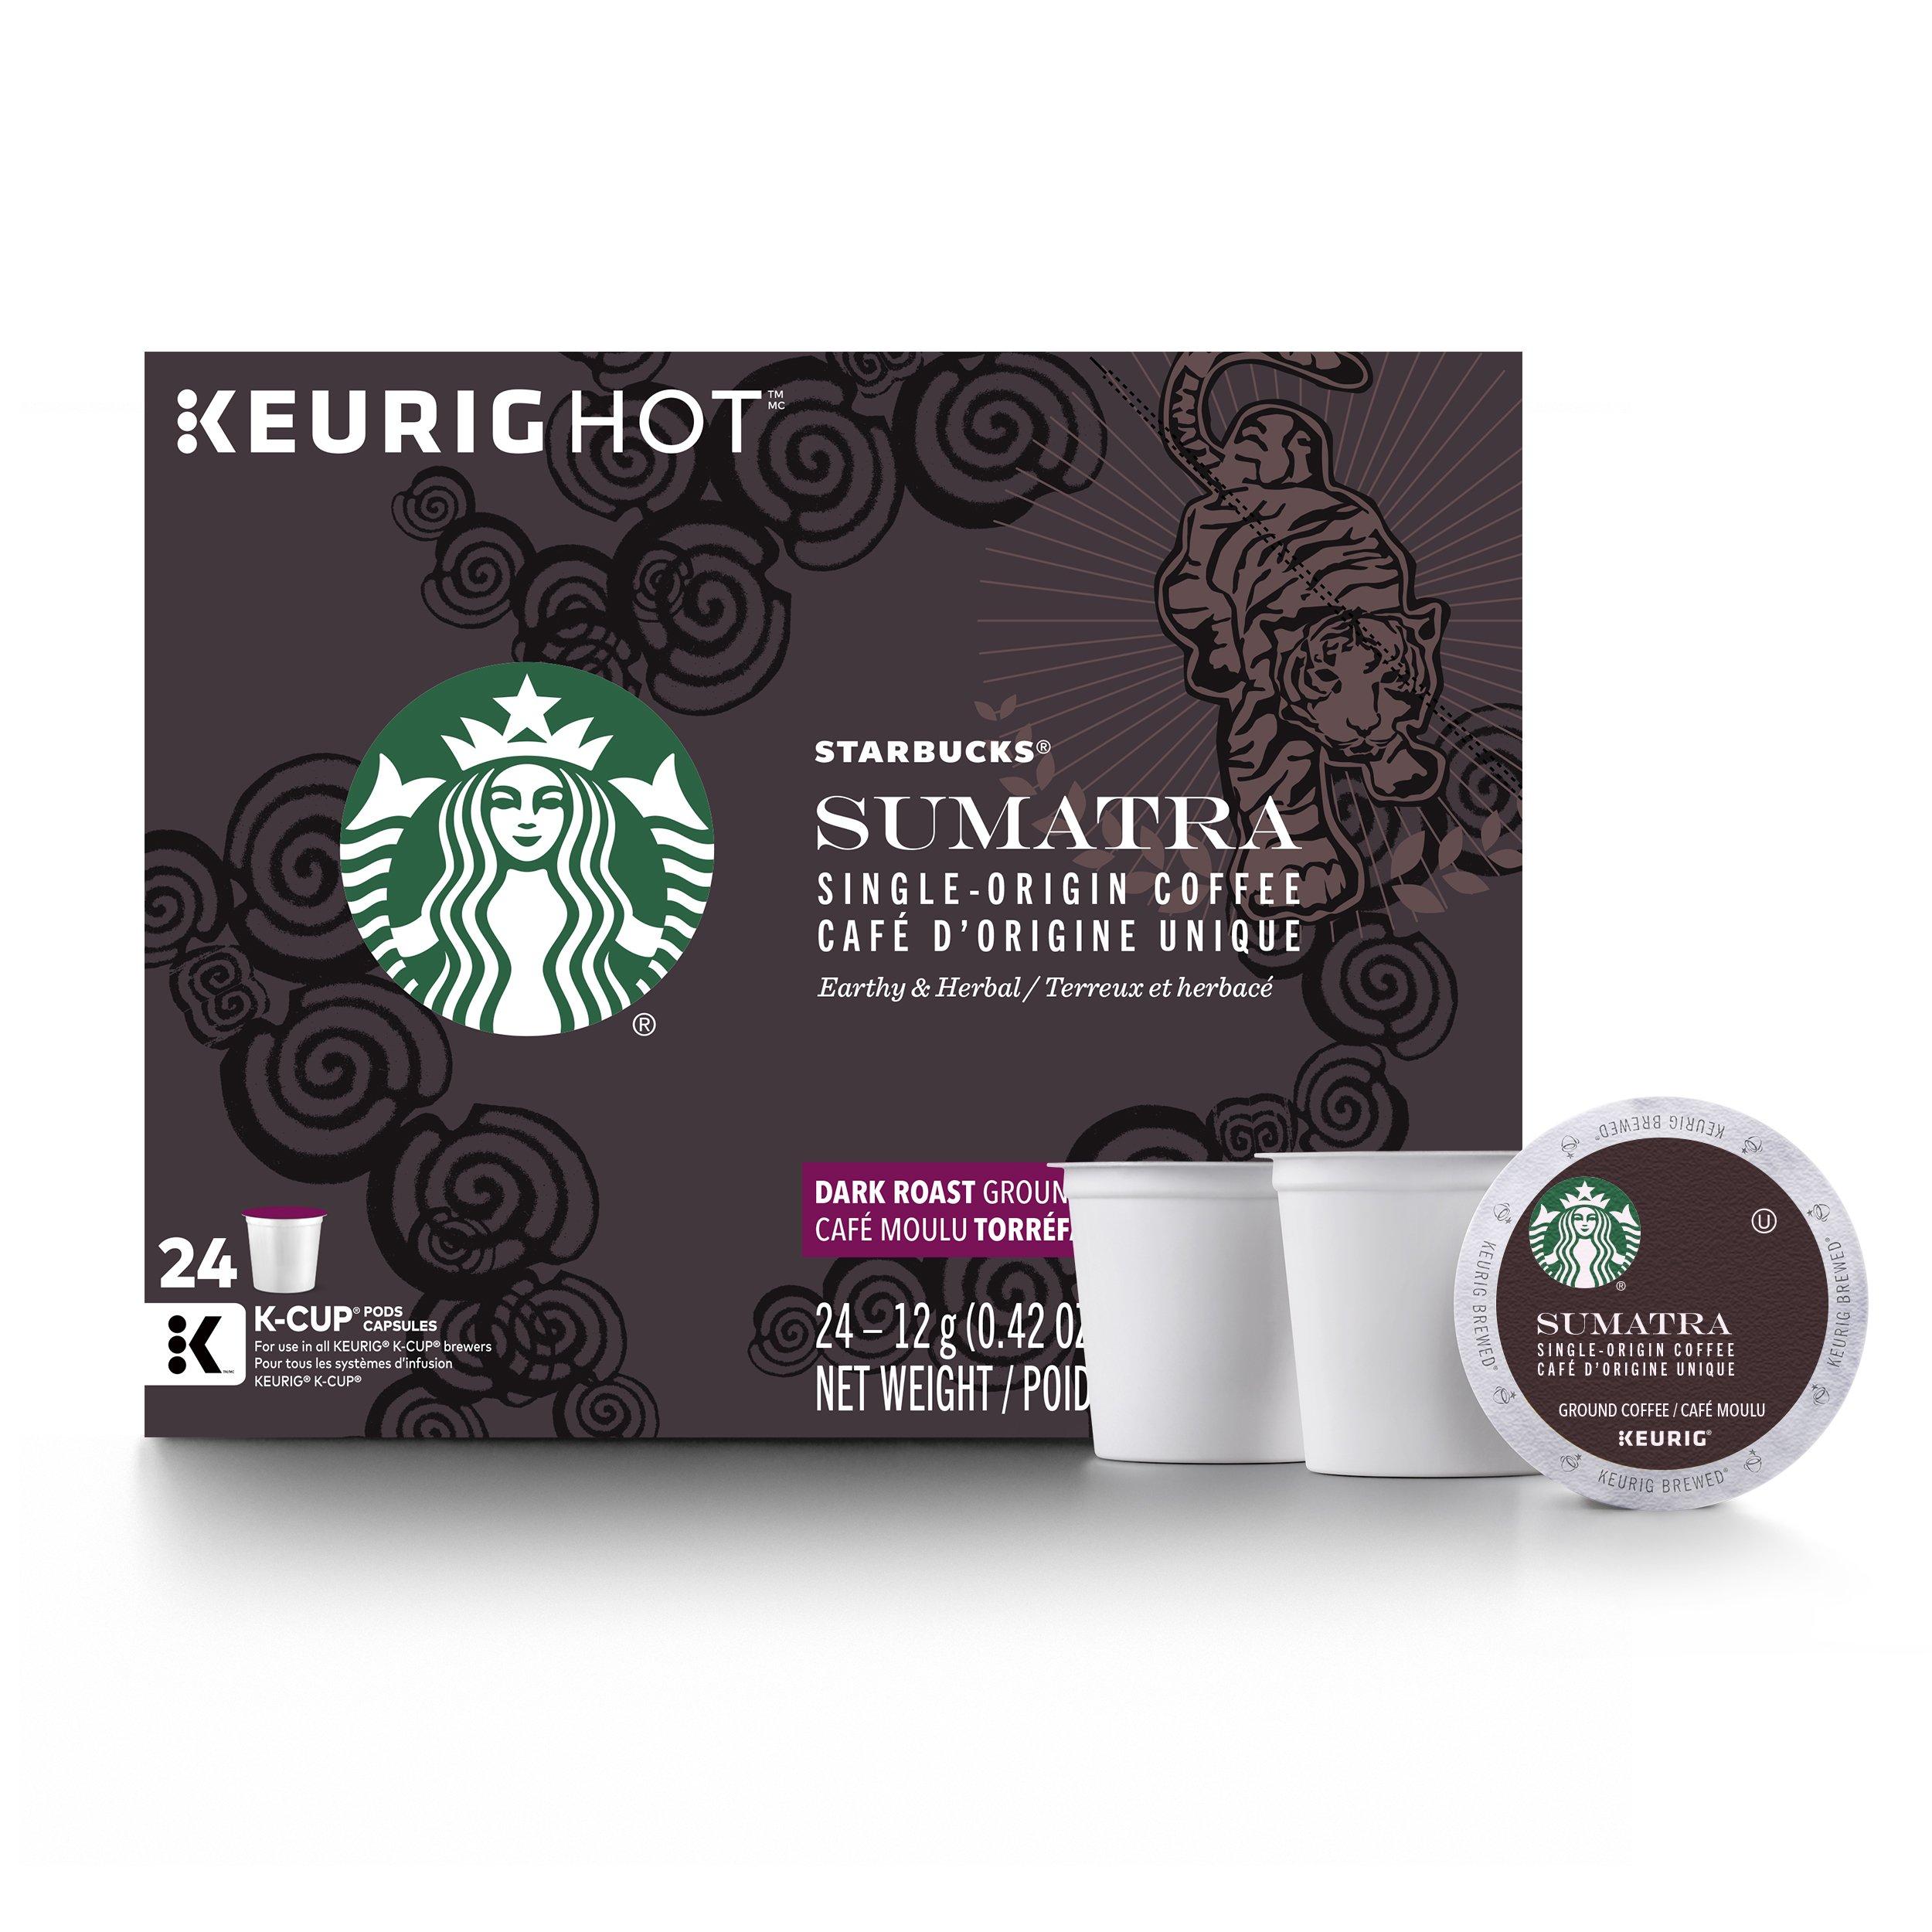 Starbucks Sumatra Dark Roast Single Cup Coffee for Keurig Brewers, 4 Boxes of 24 (96 Total K-Cup Pods)